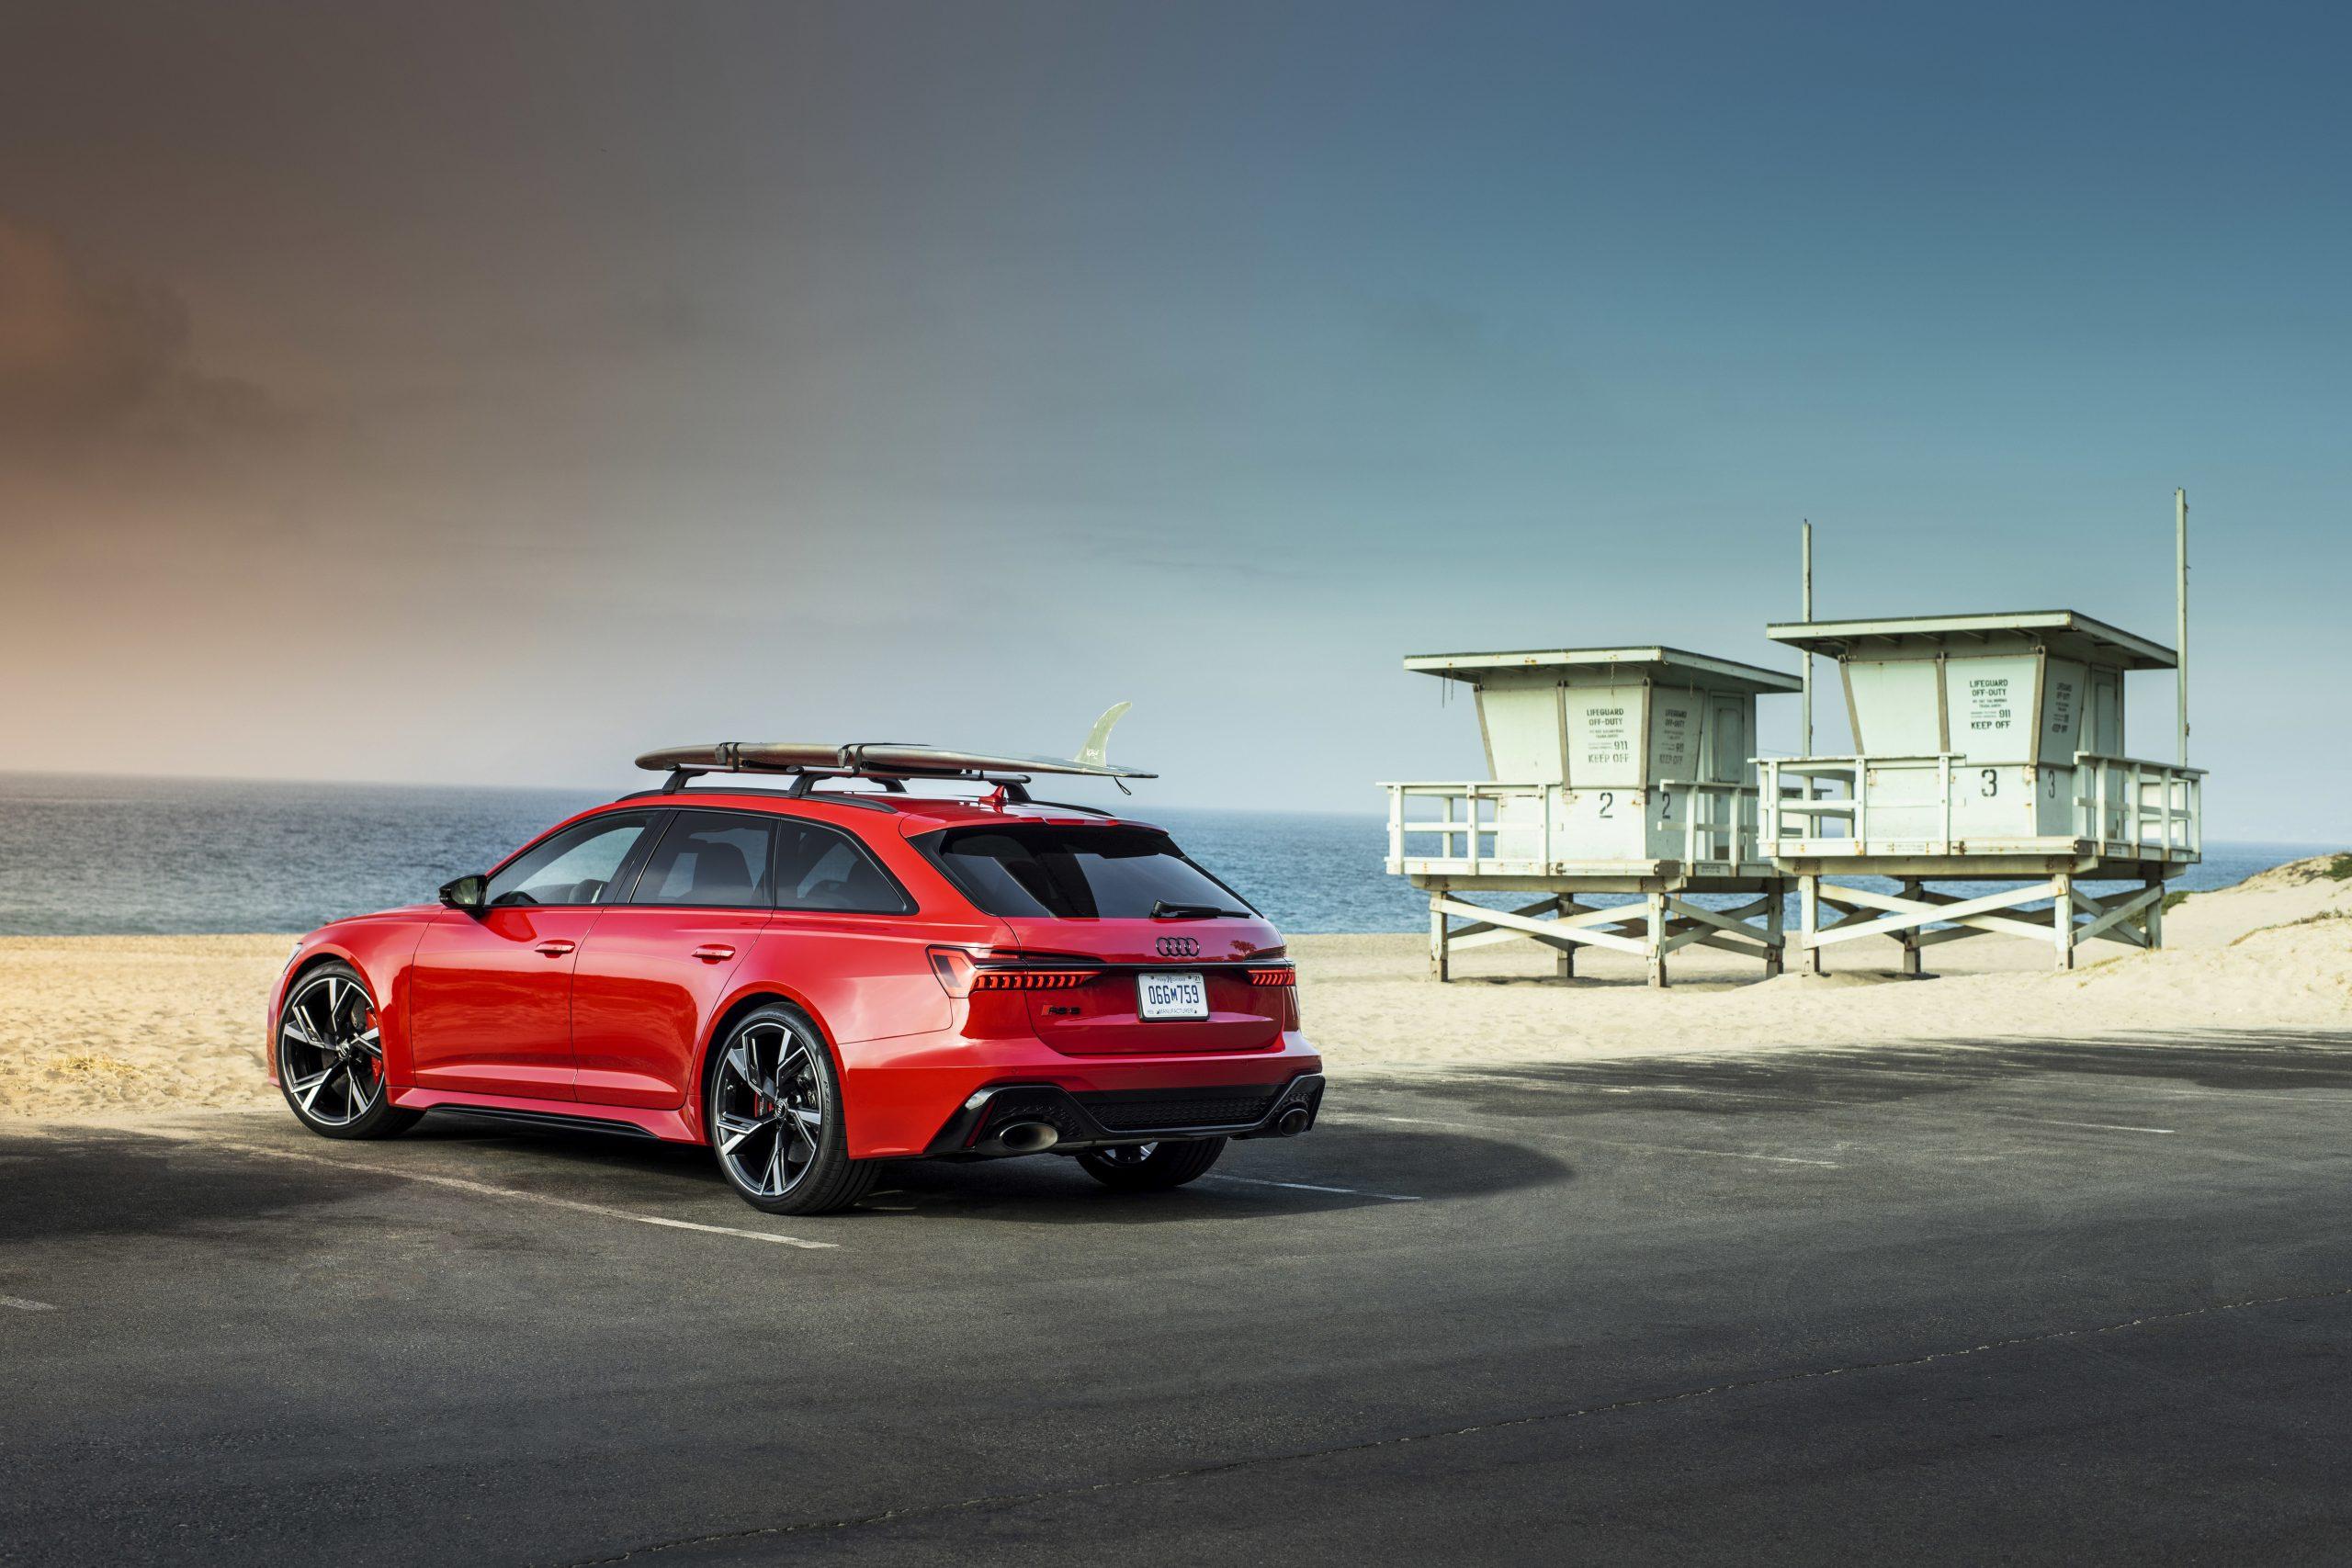 2021 Audi RS 6 Avant rear roof rack wagon